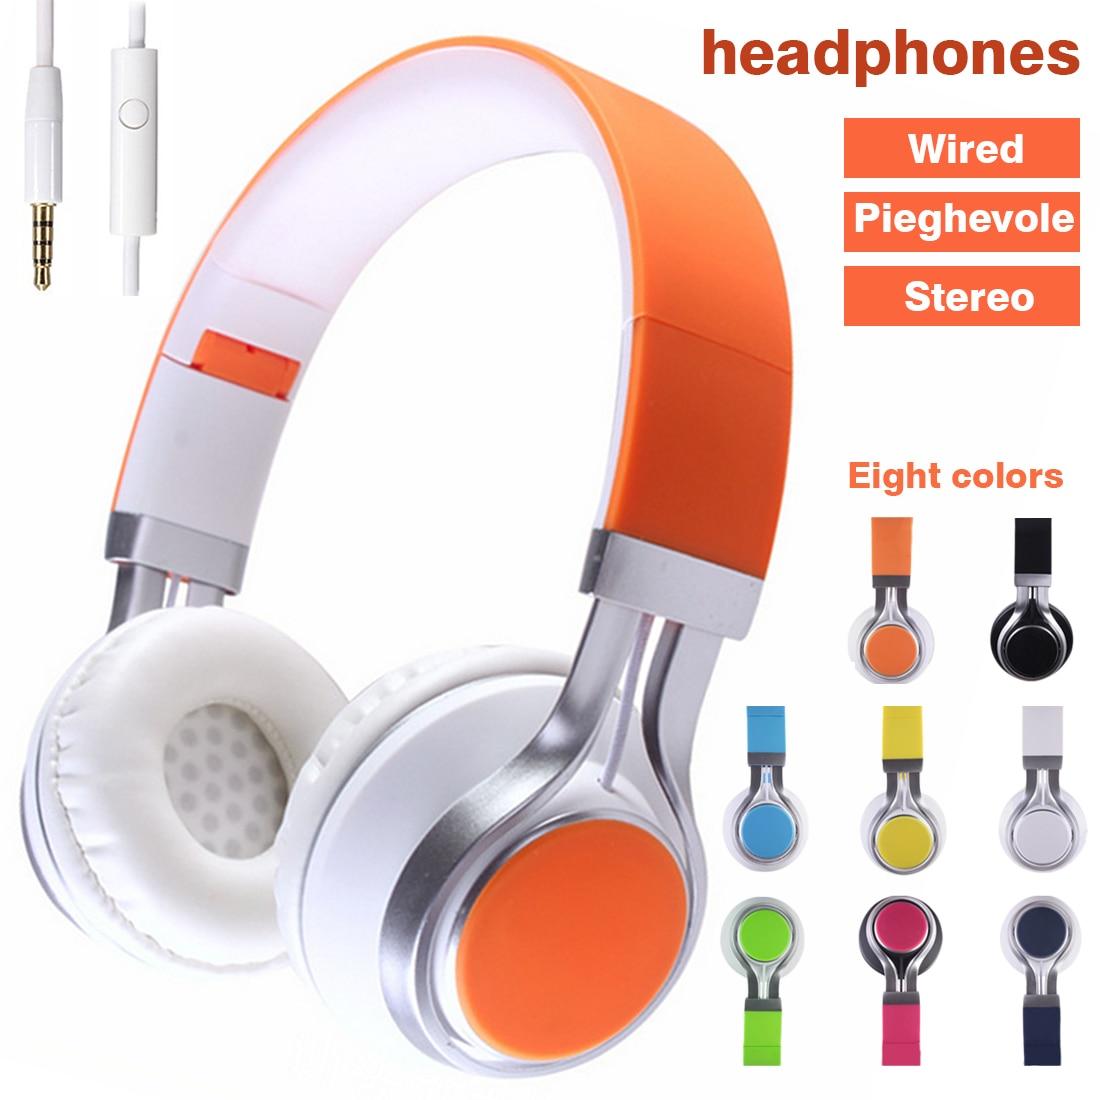 3.5MM Wired Mobile Phone Headphone Stereo Foldable Headset Earphone Earphones